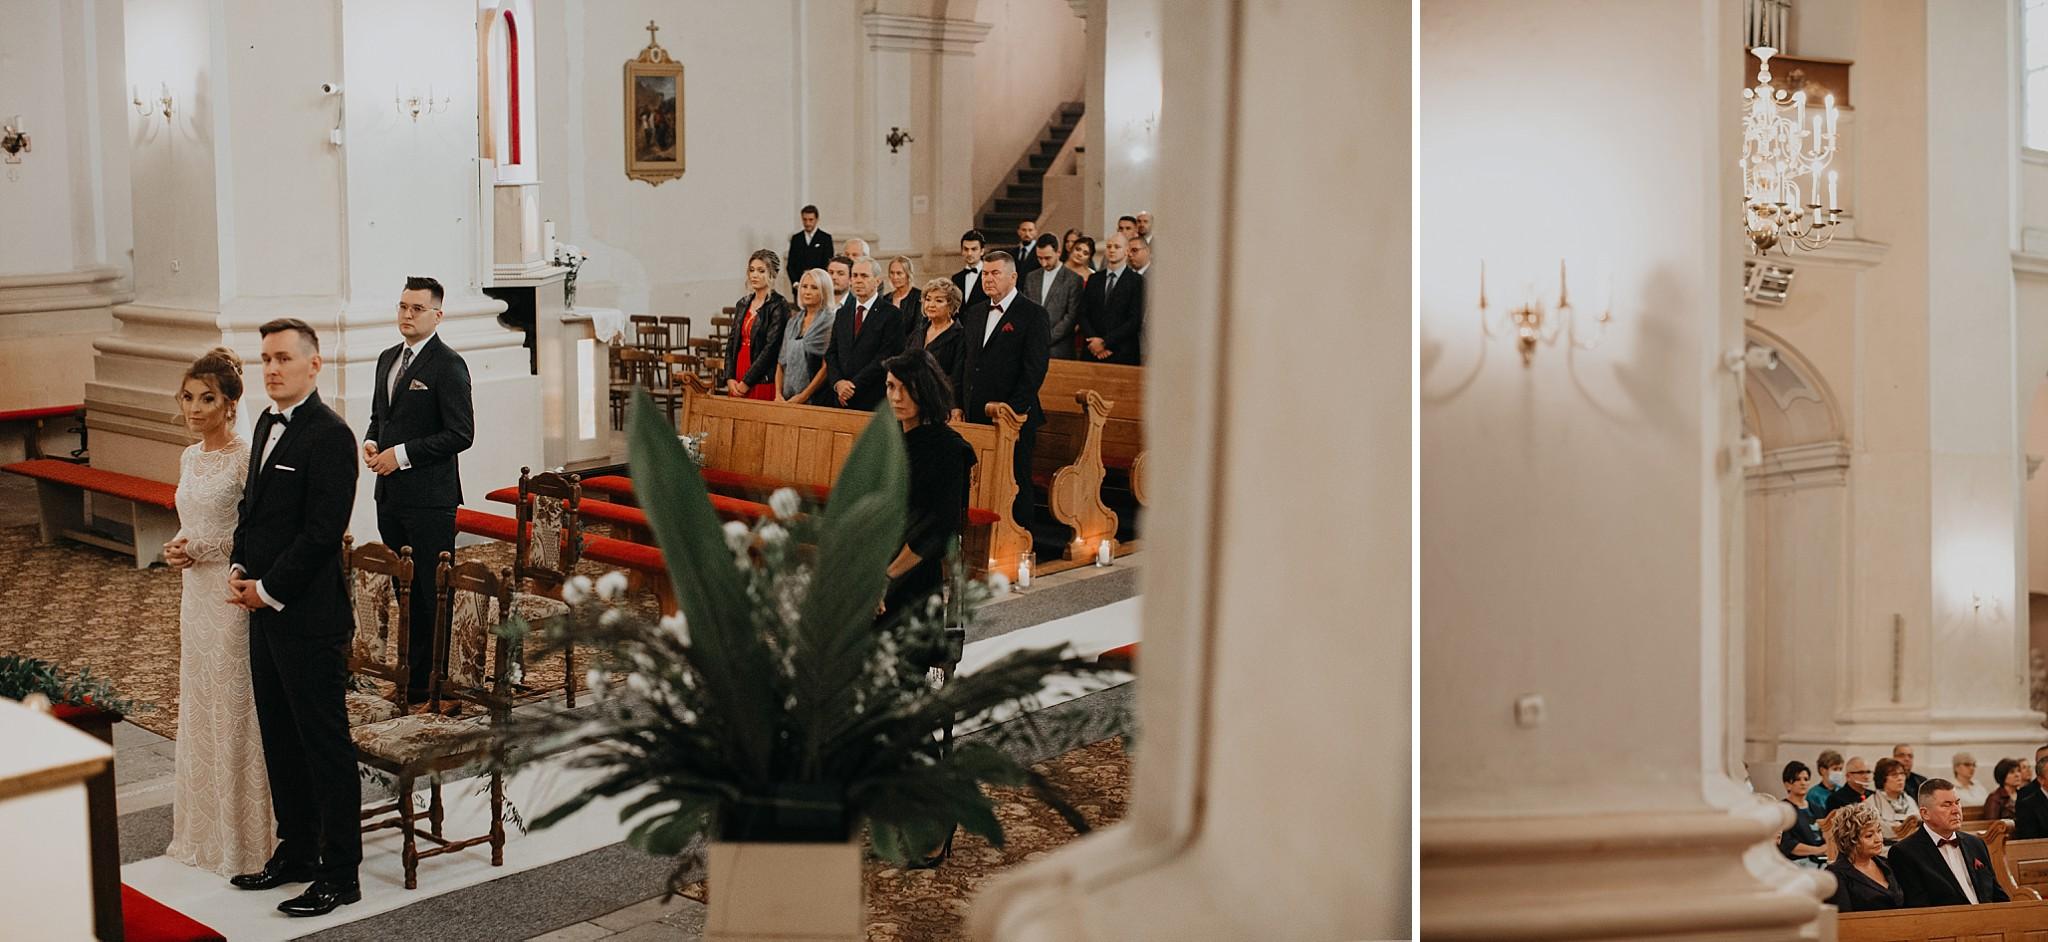 fotograf poznan wesele dobra truskawka piekne wesele pod poznaniem wesele w dobrej truskawce piekna para mloda slub marzen slub koronawirus slub listopad wesele koronawirus 163